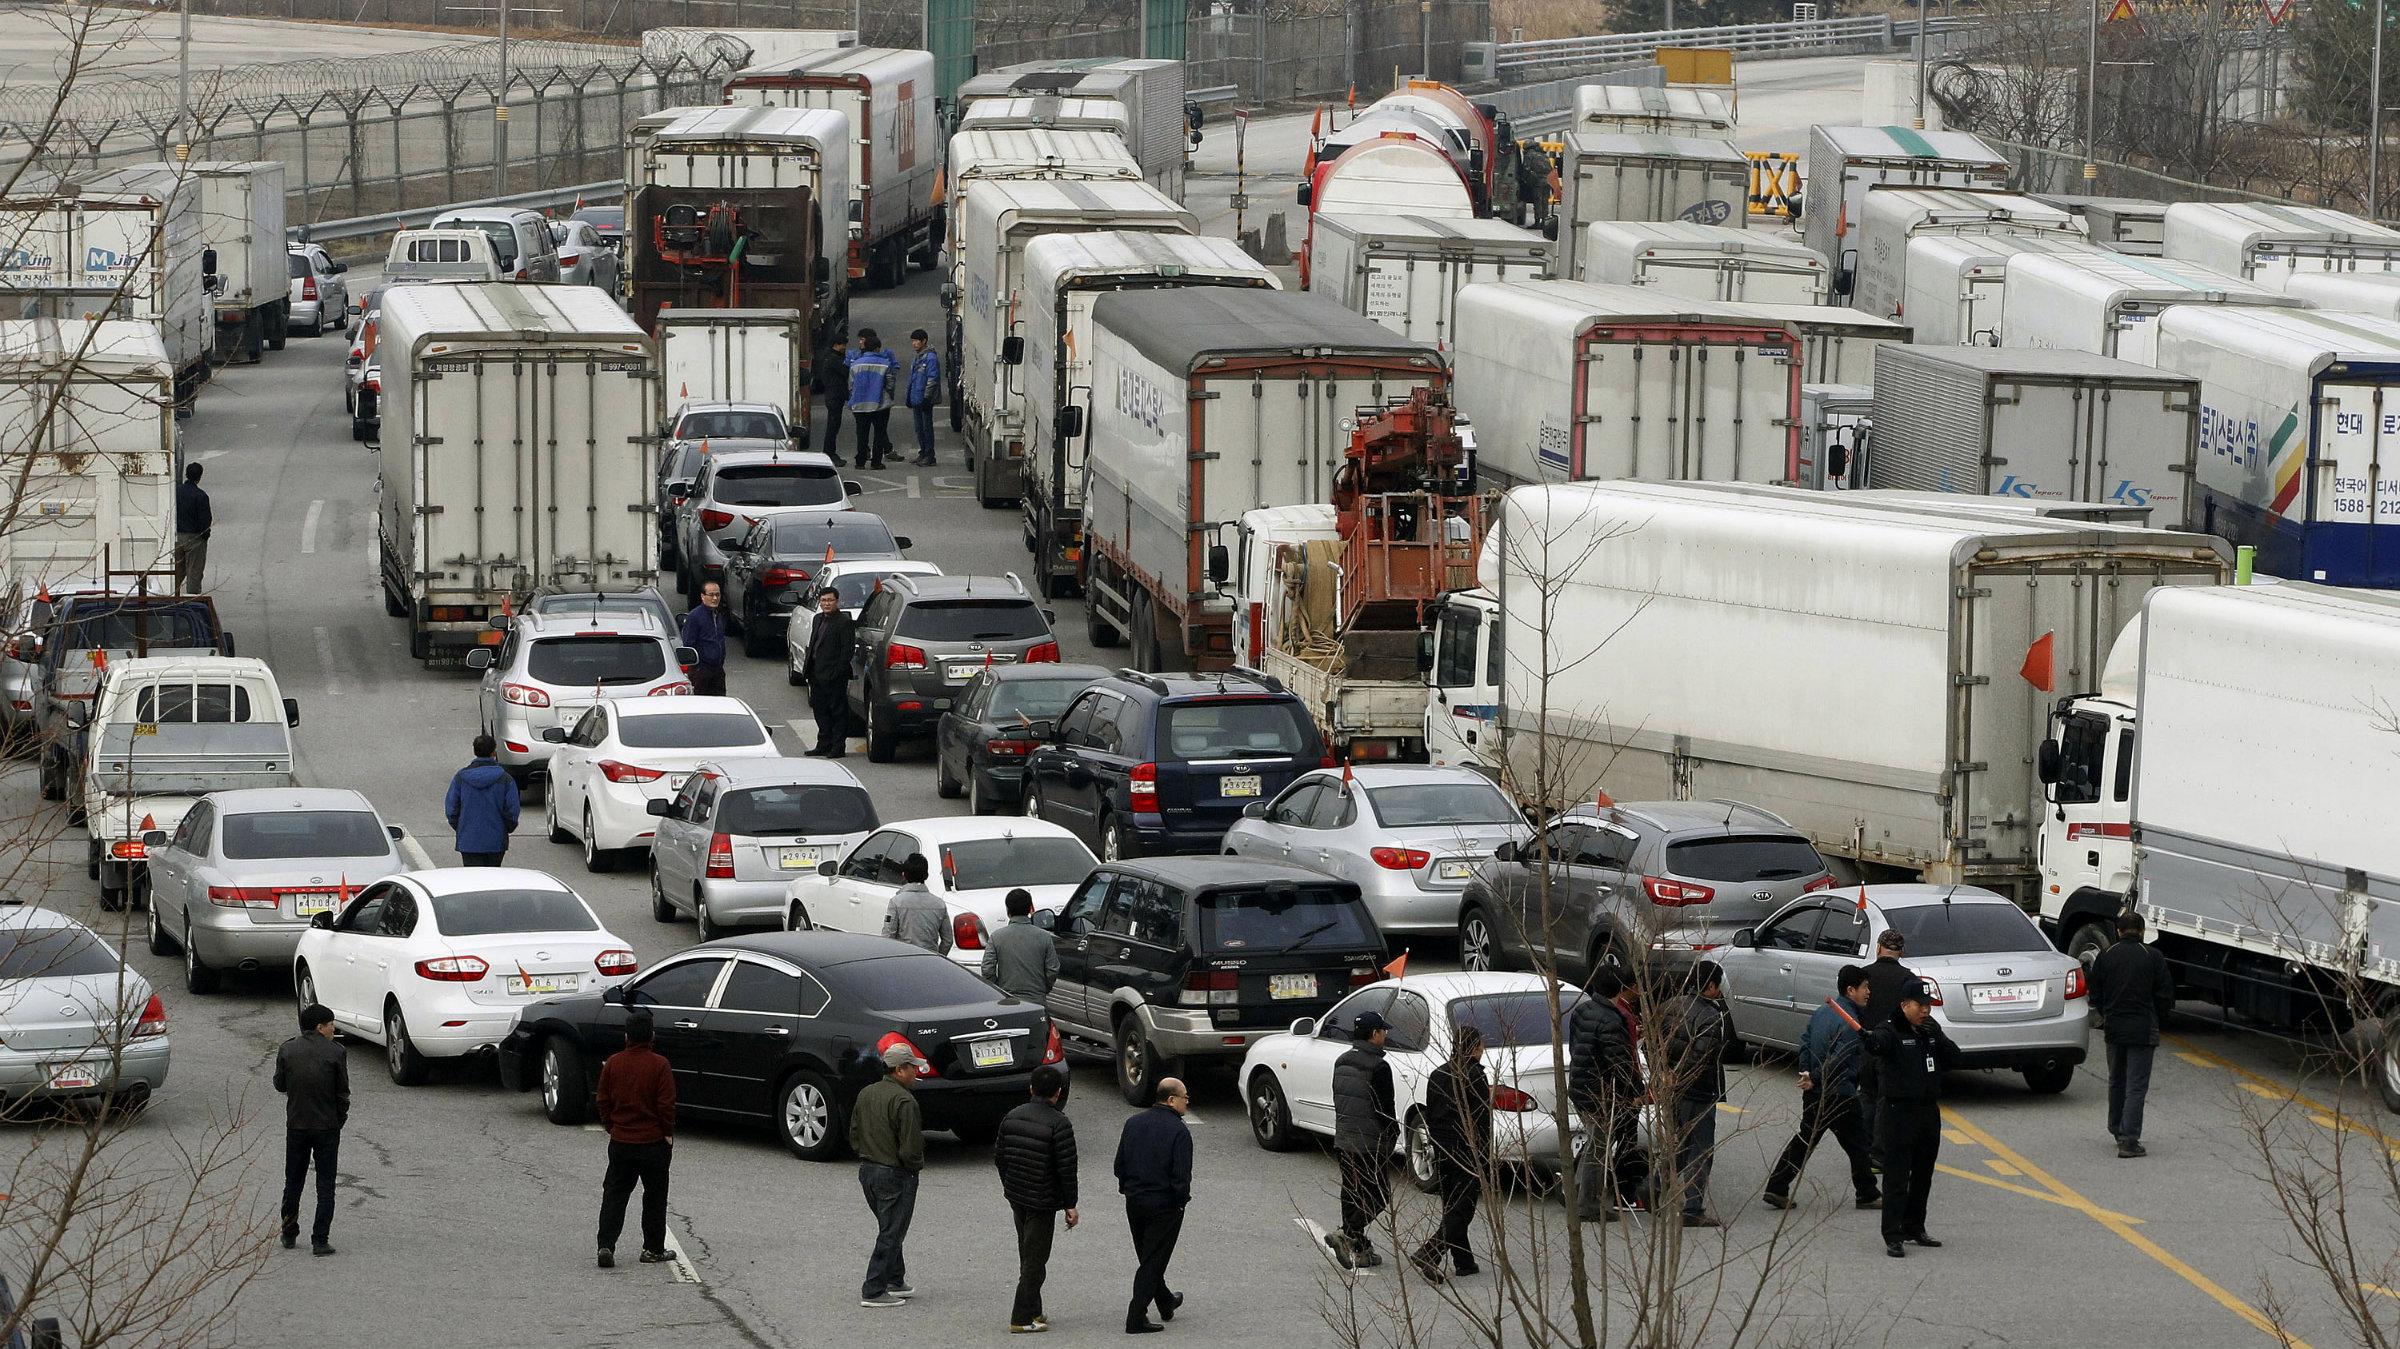 The world's tensest commute